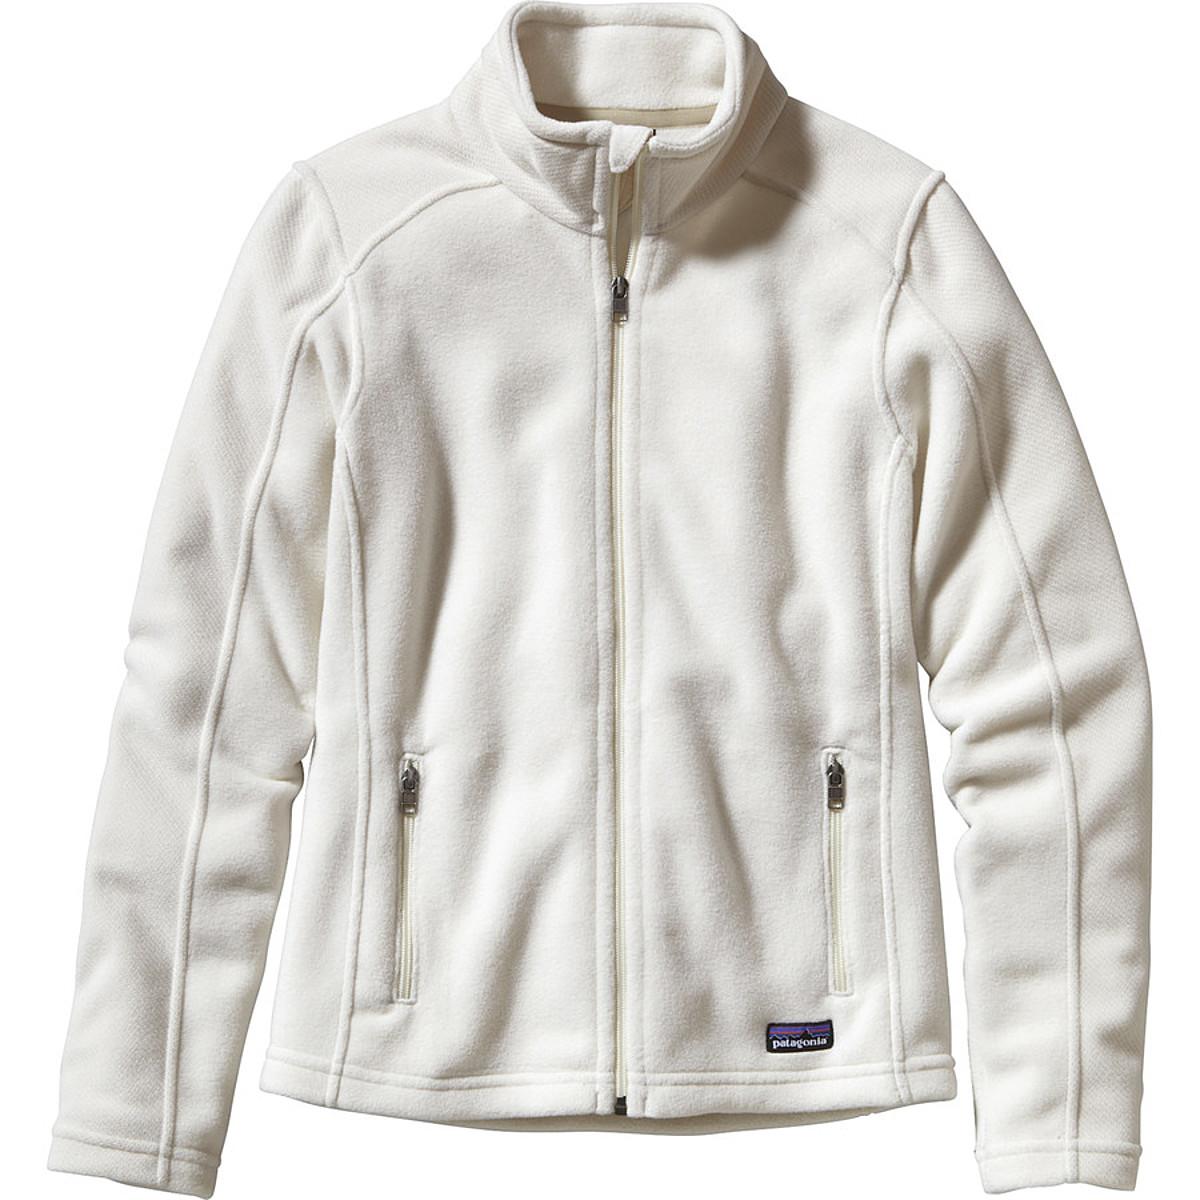 Patagonia Simple Synchilla Jacket